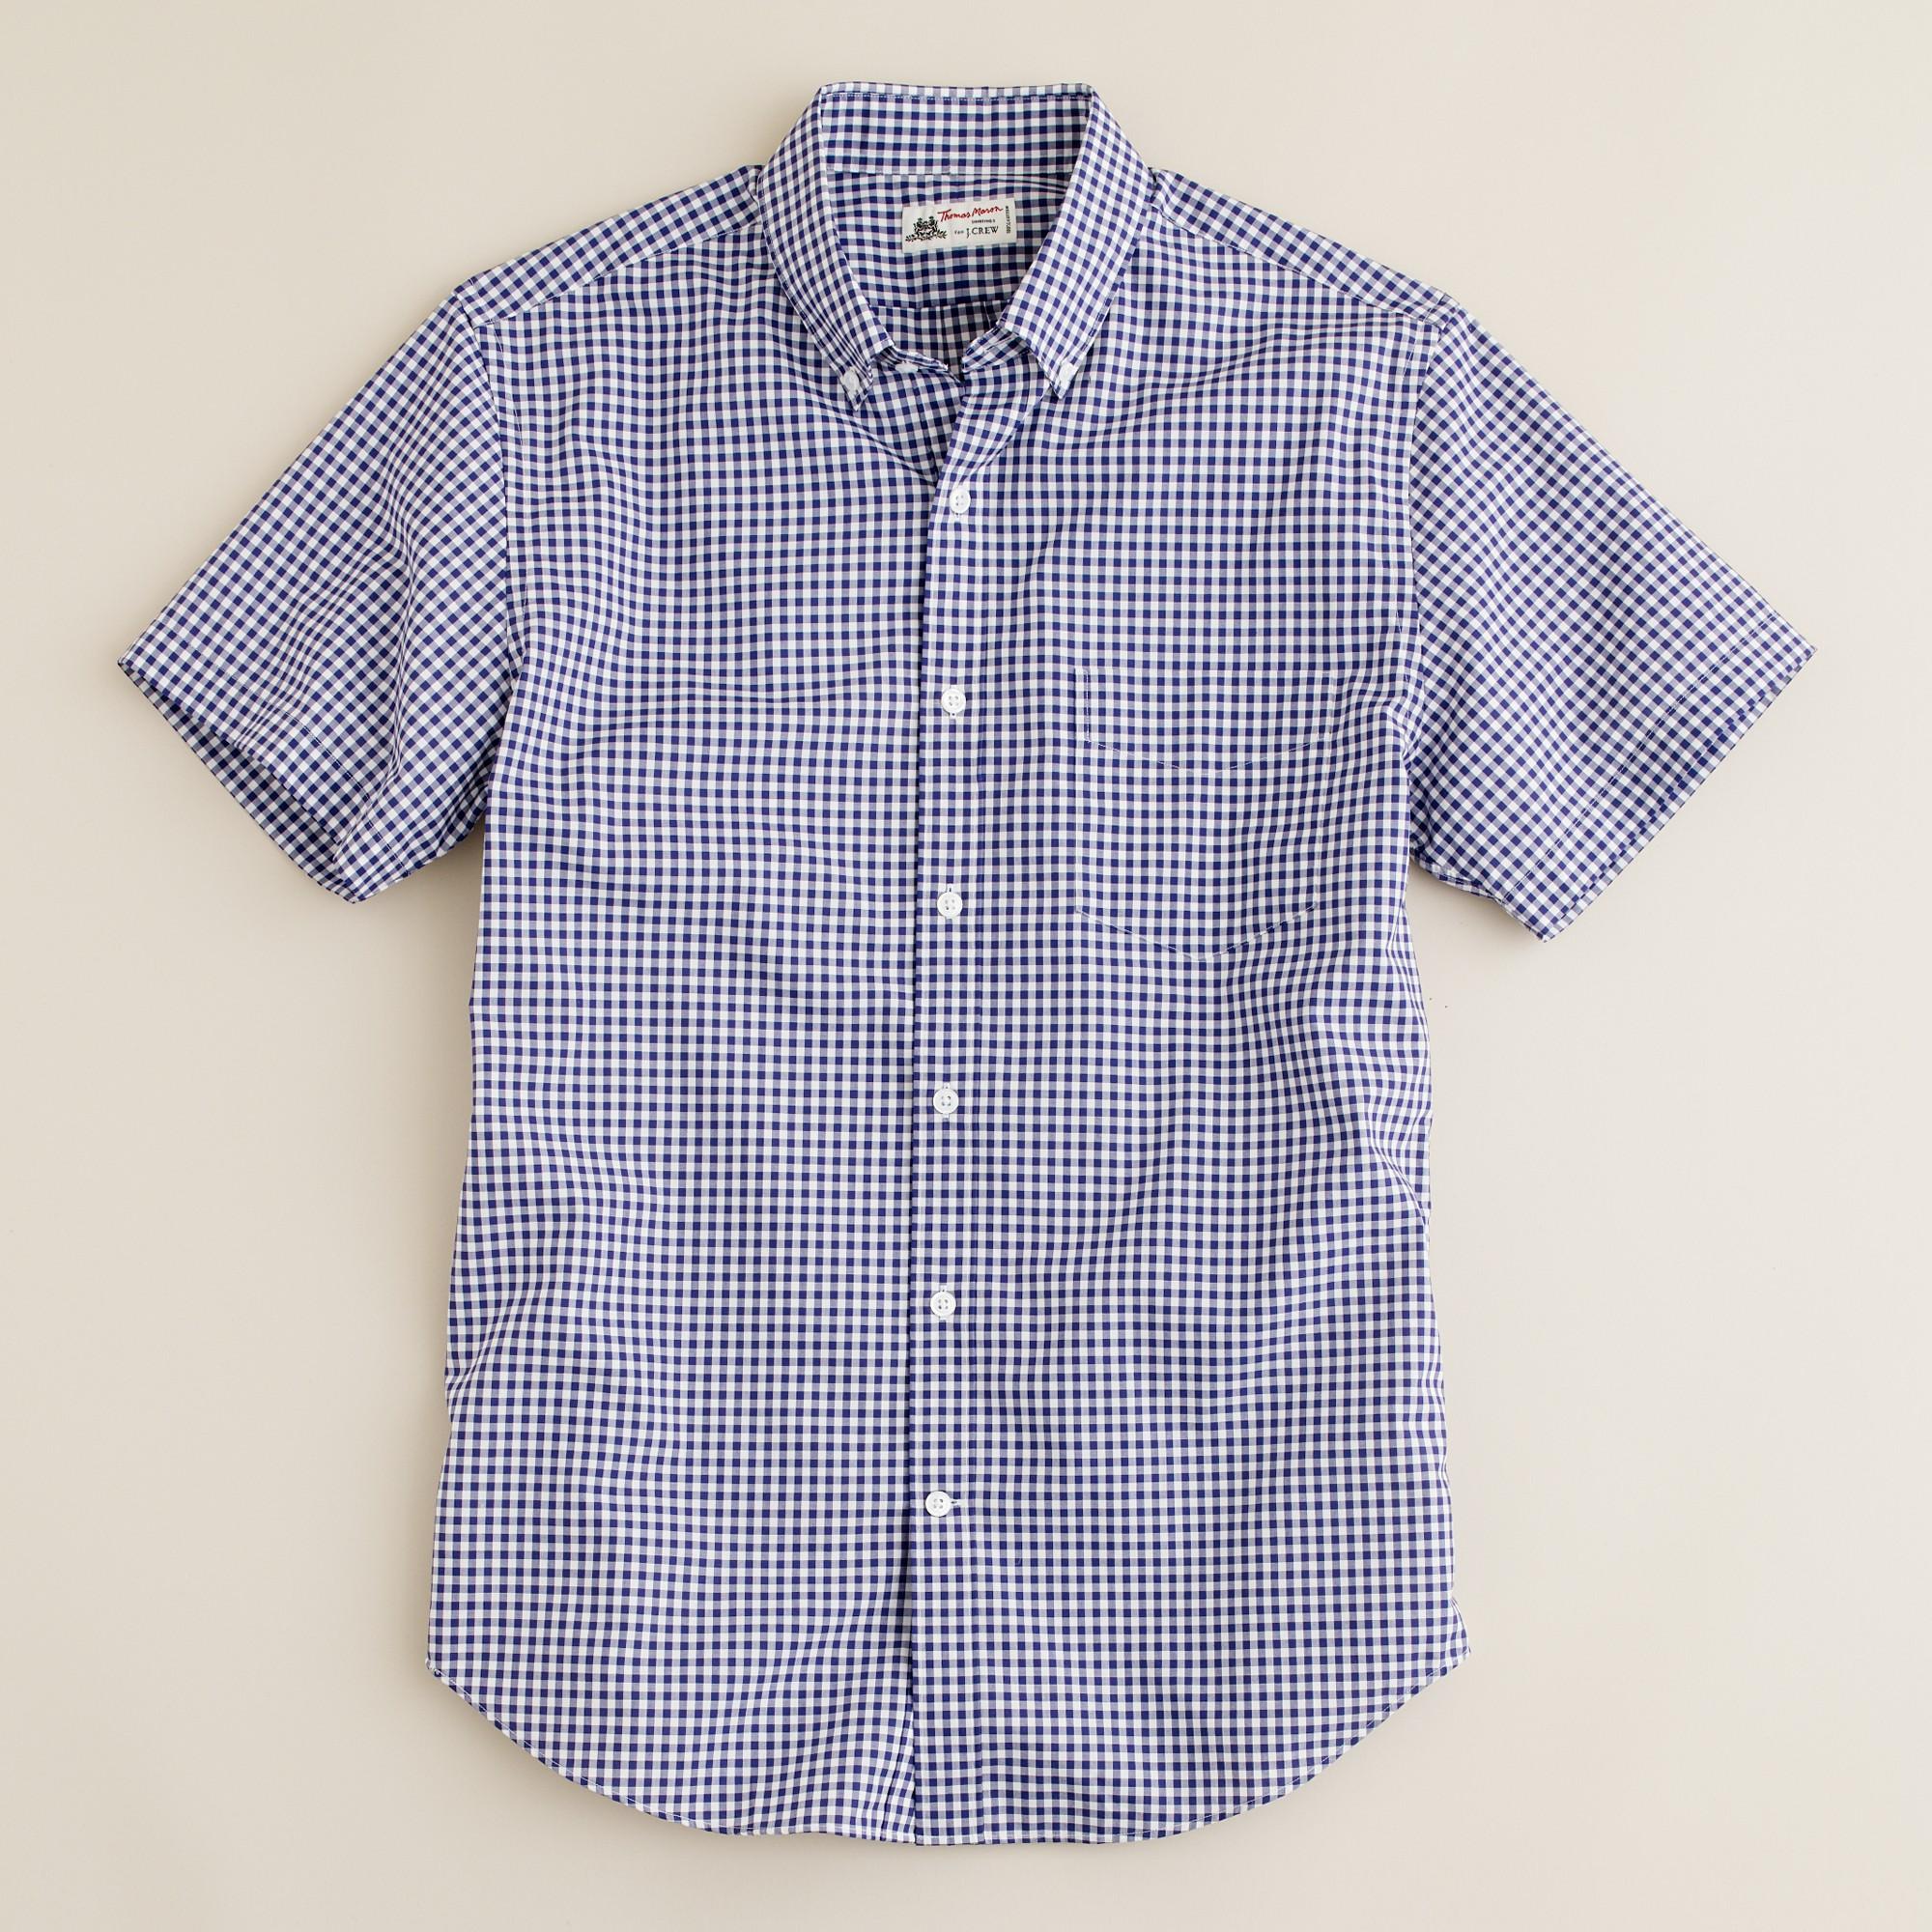 Thomas Mason Short Sleeve Ludlow Shirt In Navy